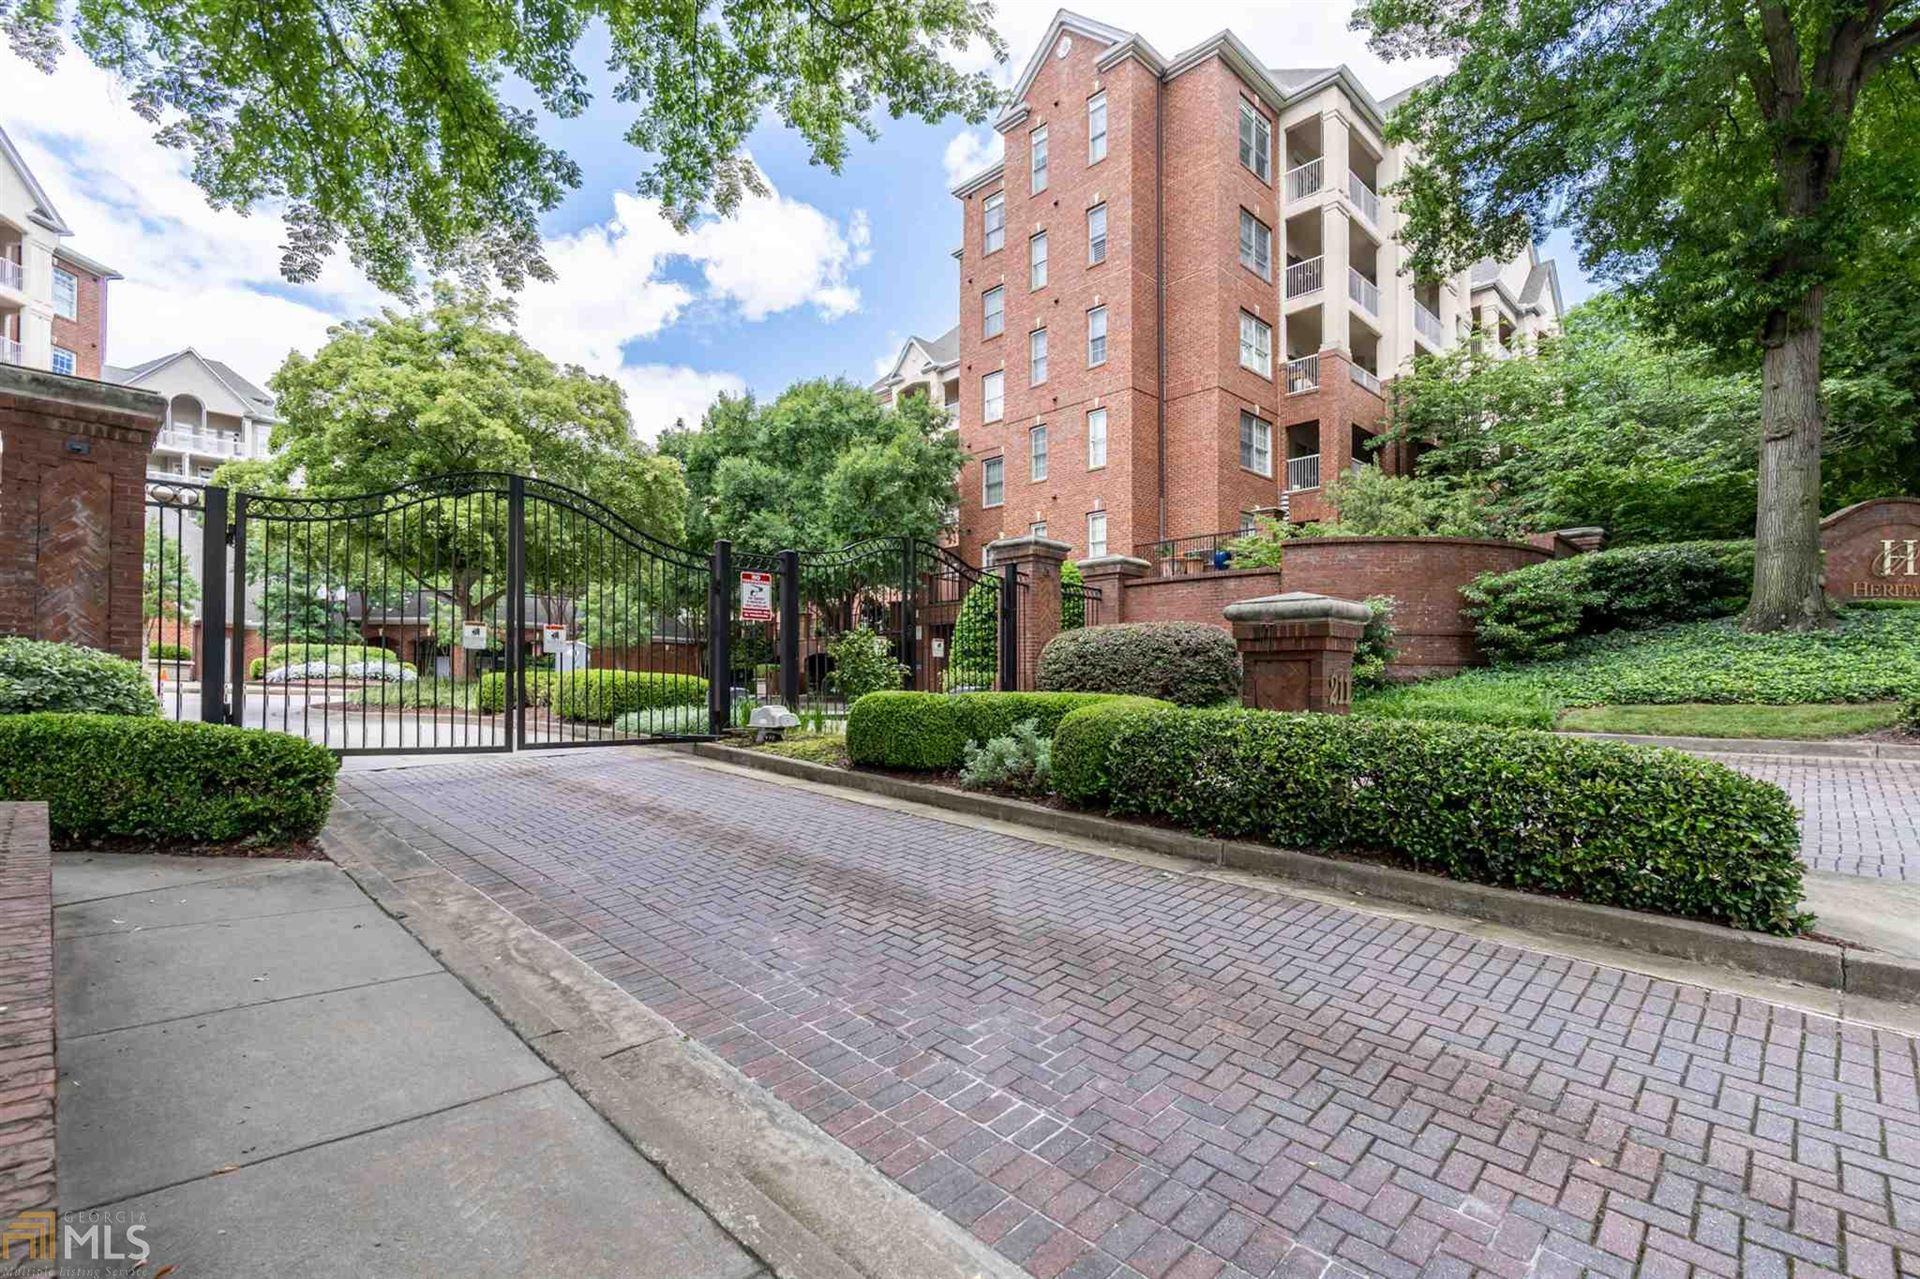 211 Colonial Homes Dr, Atlanta, GA 30309 - #: 8807853